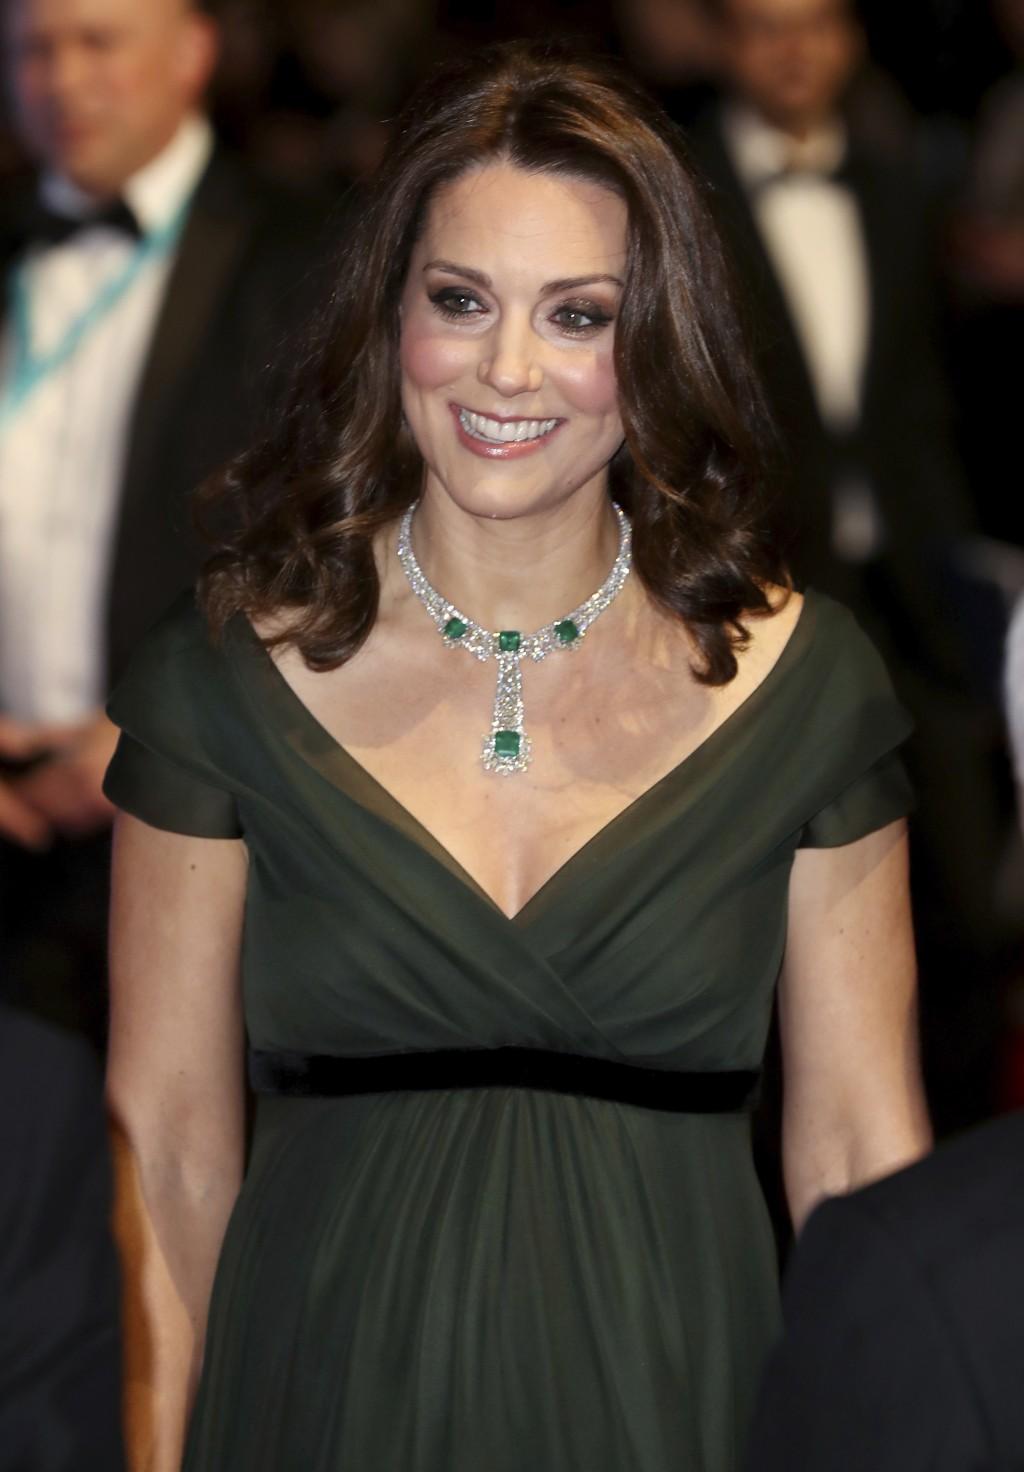 Britain's Kate, Duchess of Cambridge arrives for the BAFTA 2018 Awards in London, Sunday, Feb. 18, 2018. (Chris Jackson/Pool via AP)